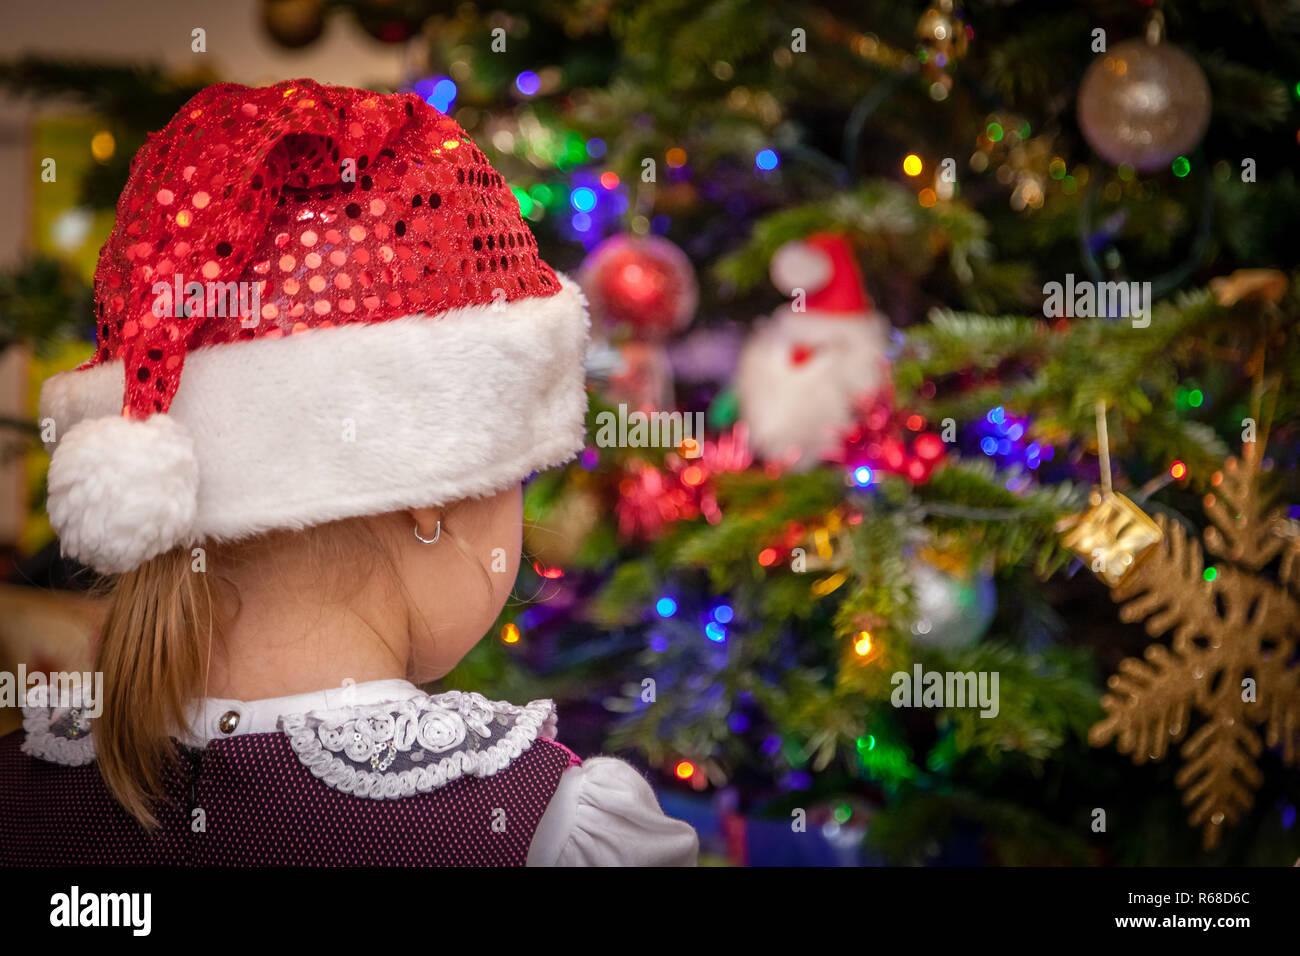 Santa Beanie Baby Stock Photos   Santa Beanie Baby Stock Images - Alamy f228b3458622